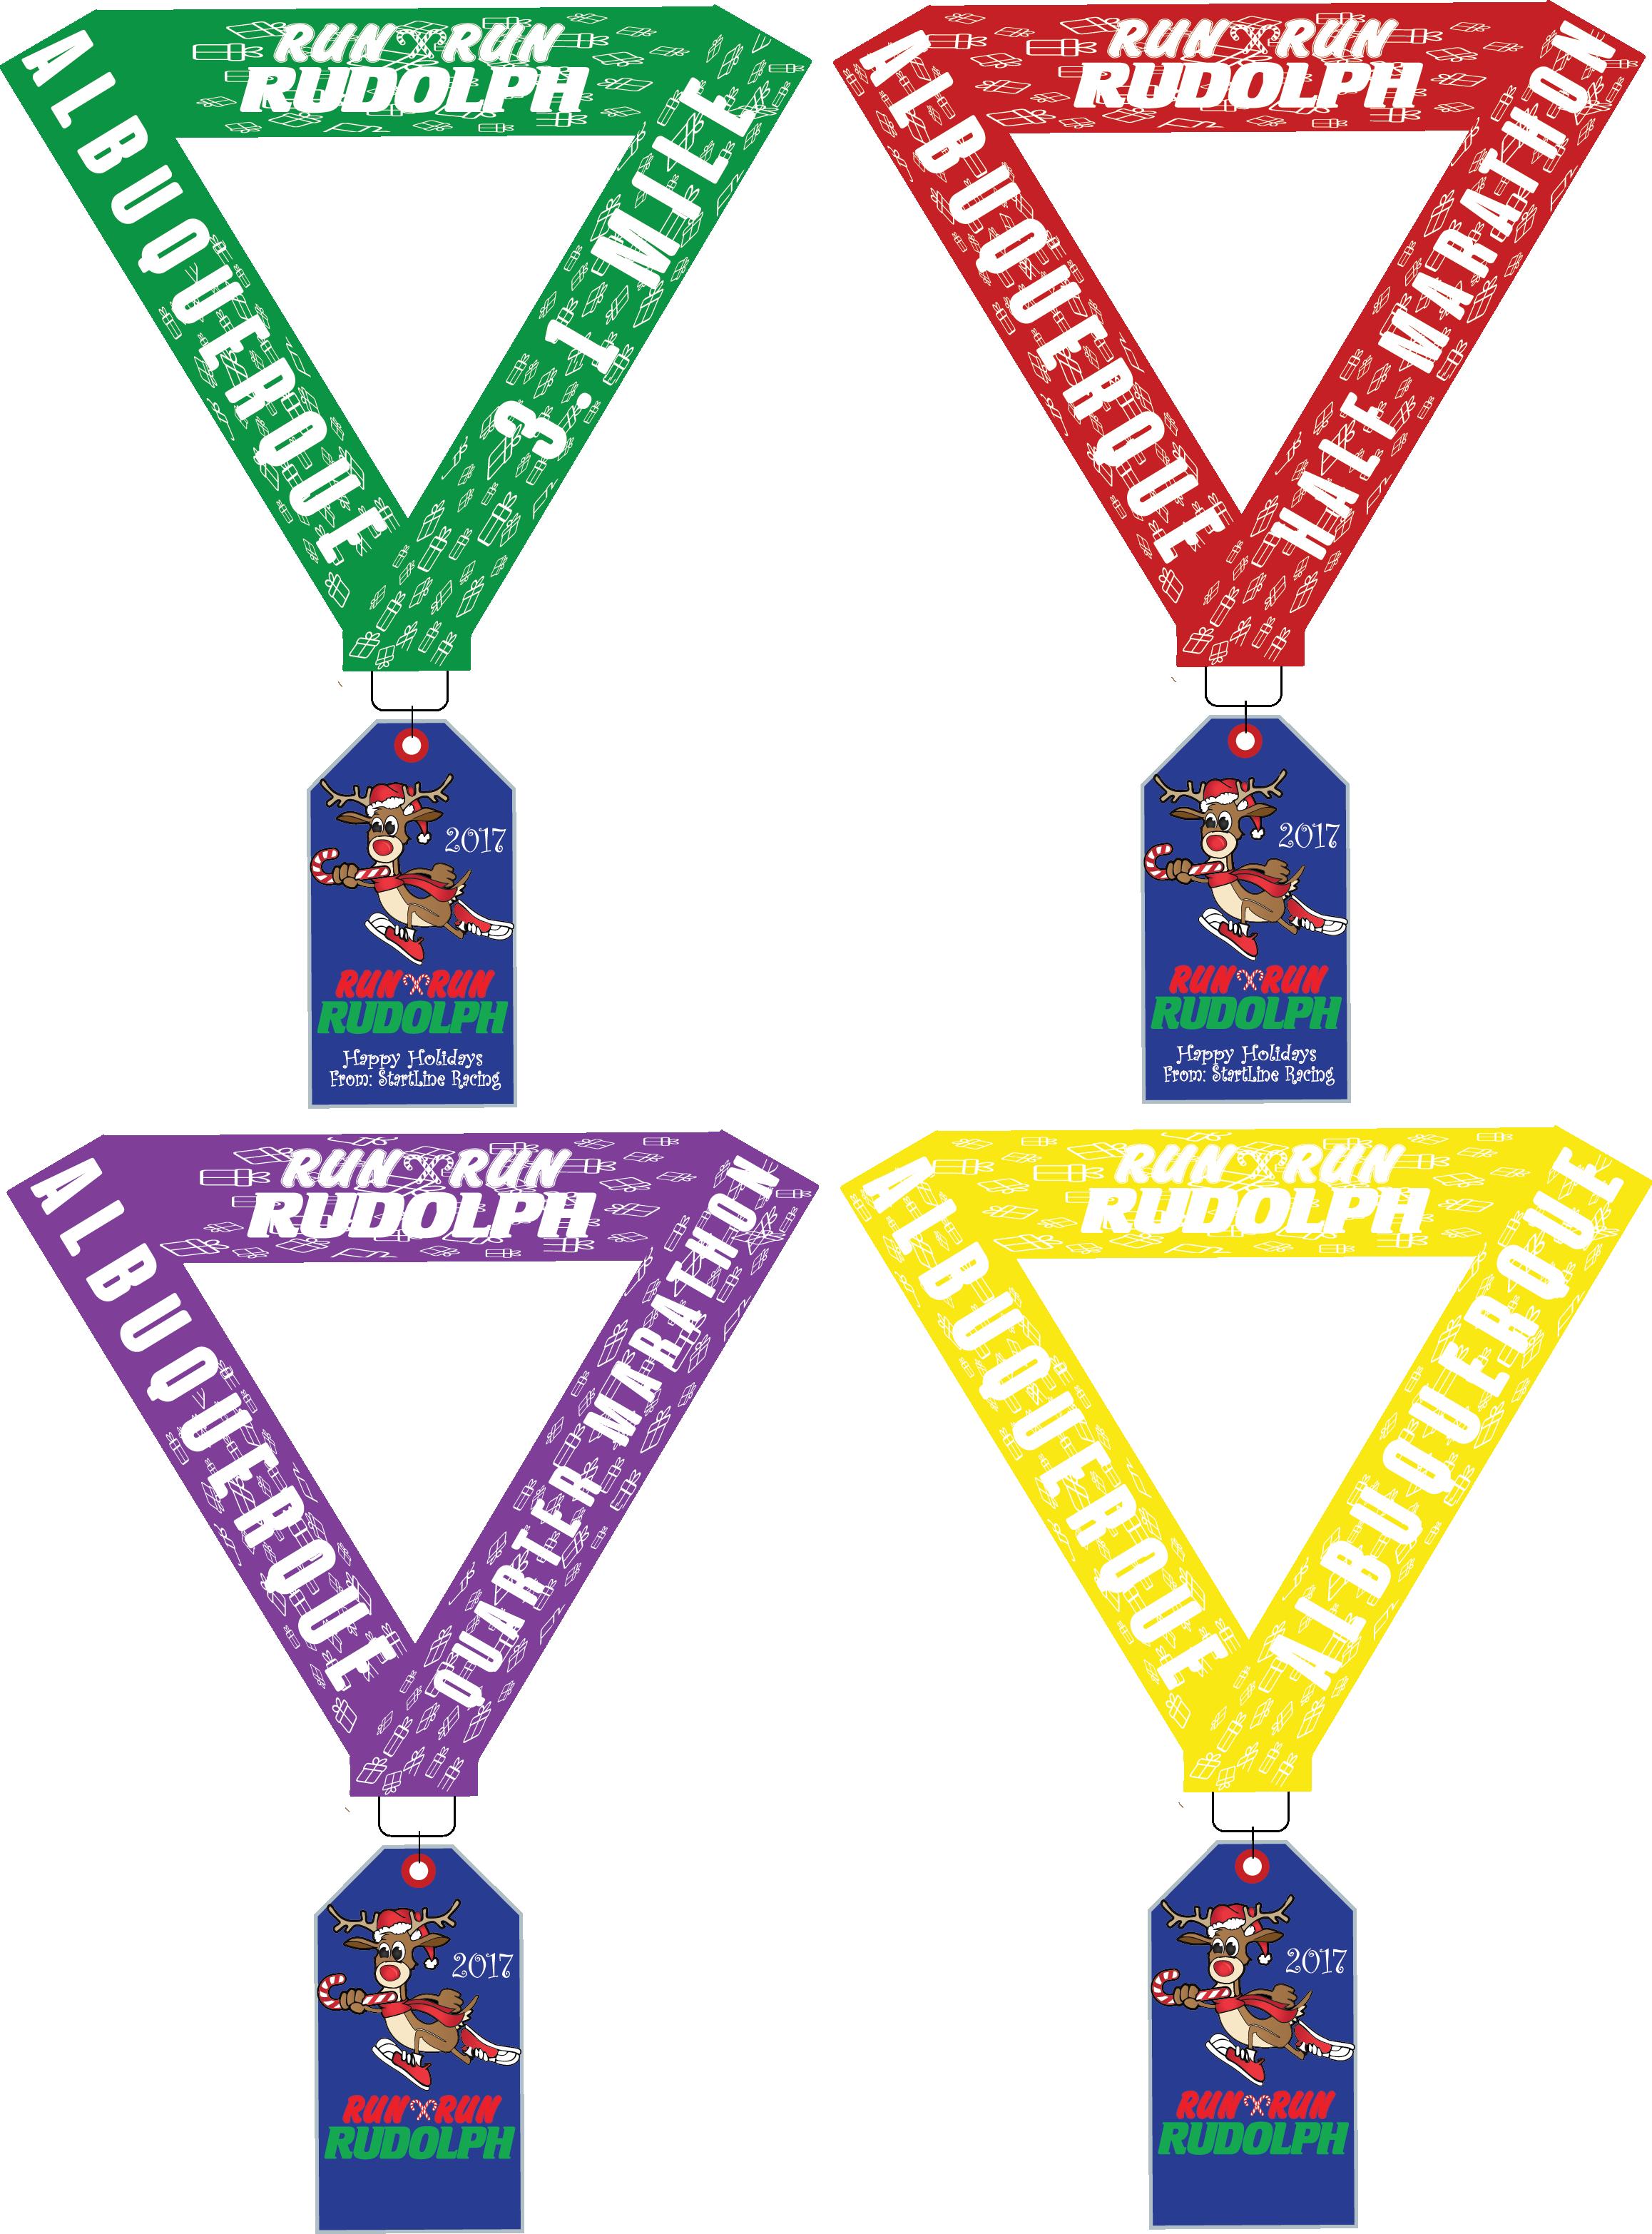 Olympics clipart marathon medal. Albuquerque run rudolph half